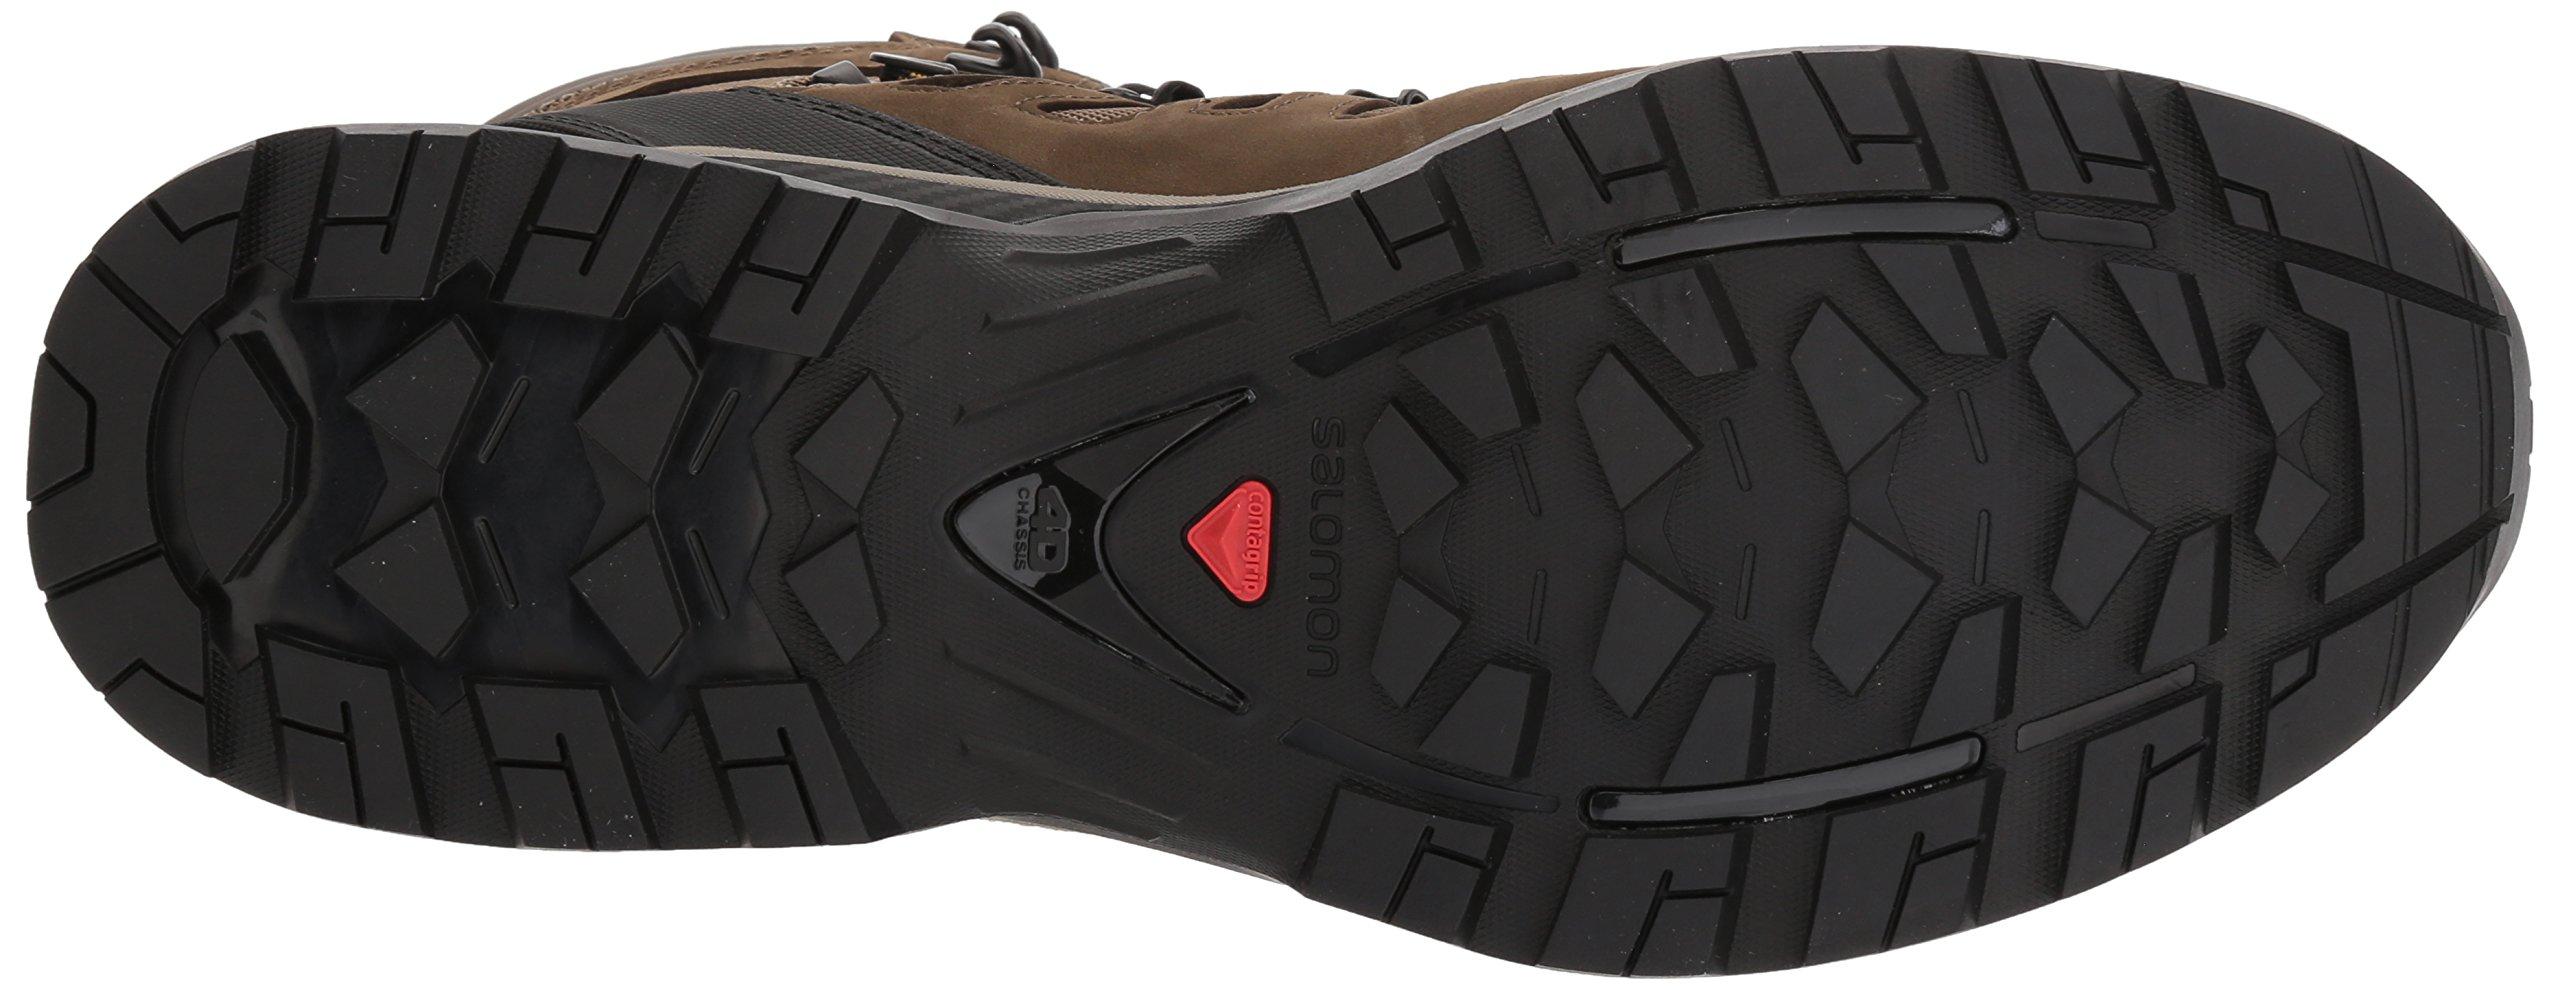 9a42f4202d4 Salomon Men's Quest 4d 3 GTX Backpacking Boots - 402455 < Hiking ...